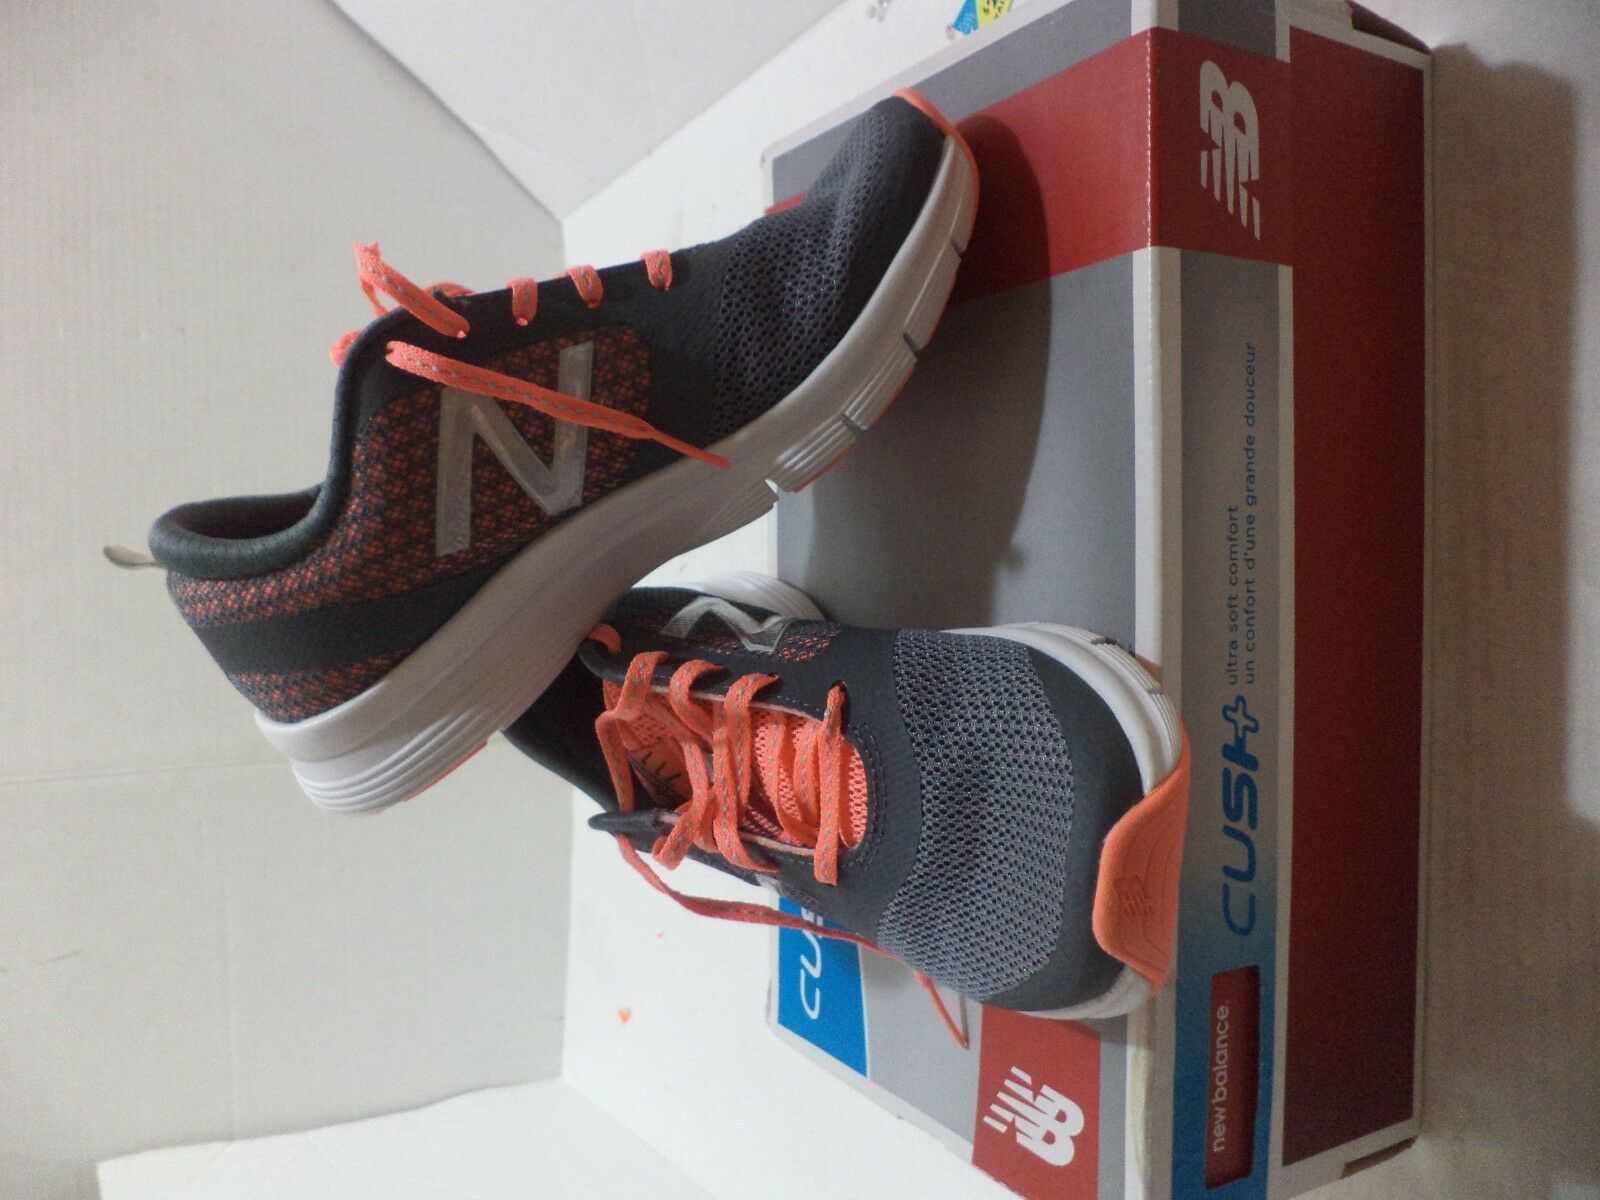 New balance WX711LF Cross-Training Zapato De Mujer Talla 6.5 6.5 6.5 Color gris, blancoo & Peach  minoristas en línea